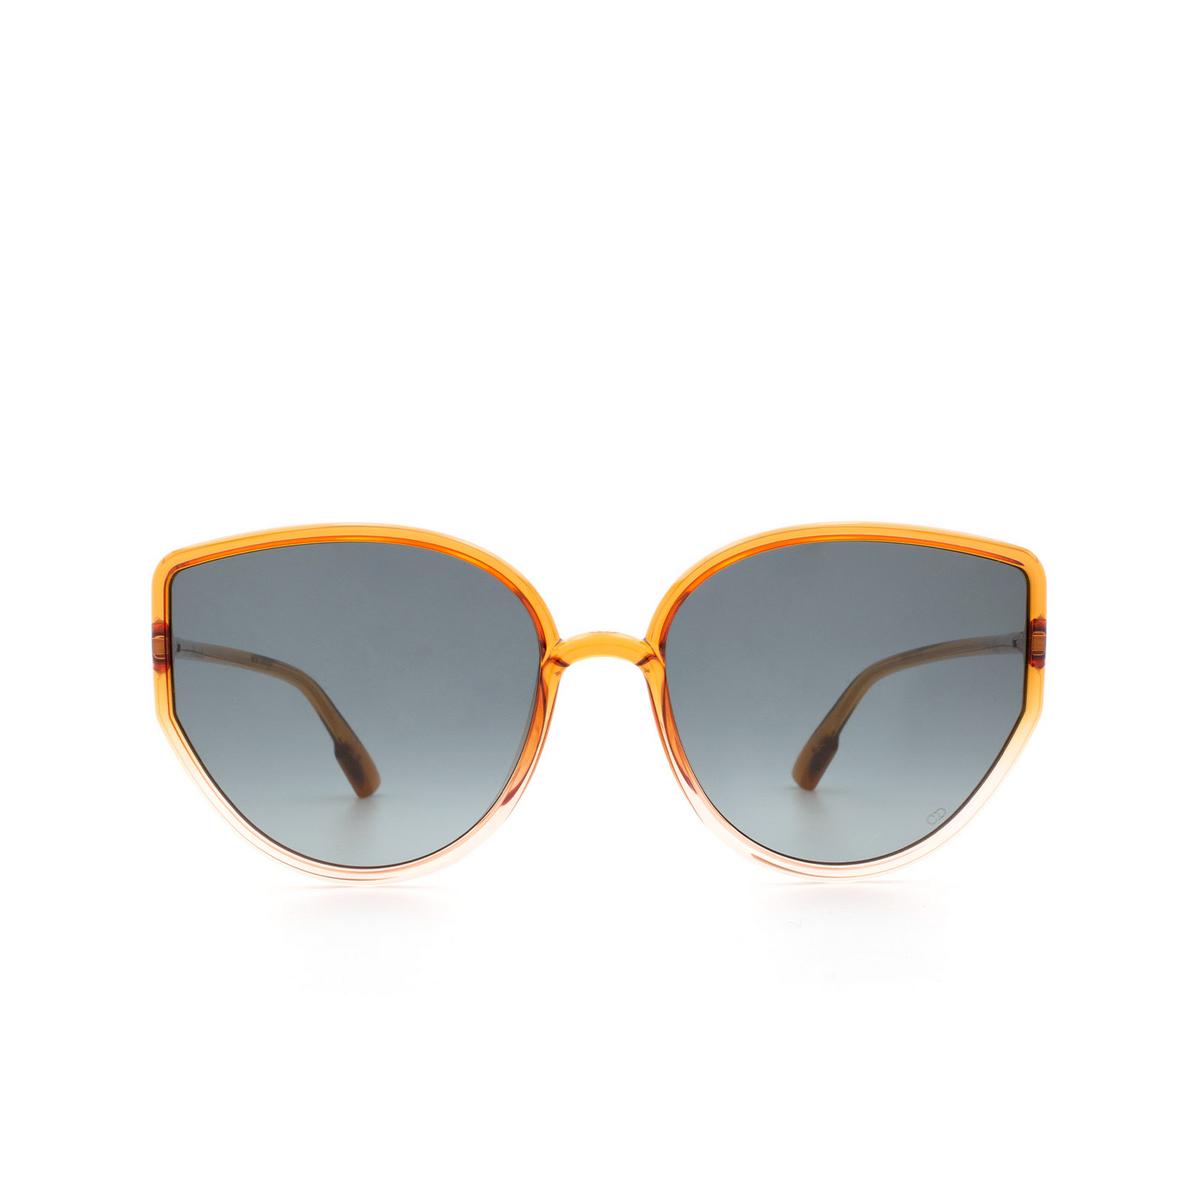 Dior® Round Sunglasses: SOSTELLAIRE4 color Orange Gradient Pink 09Z/1I.